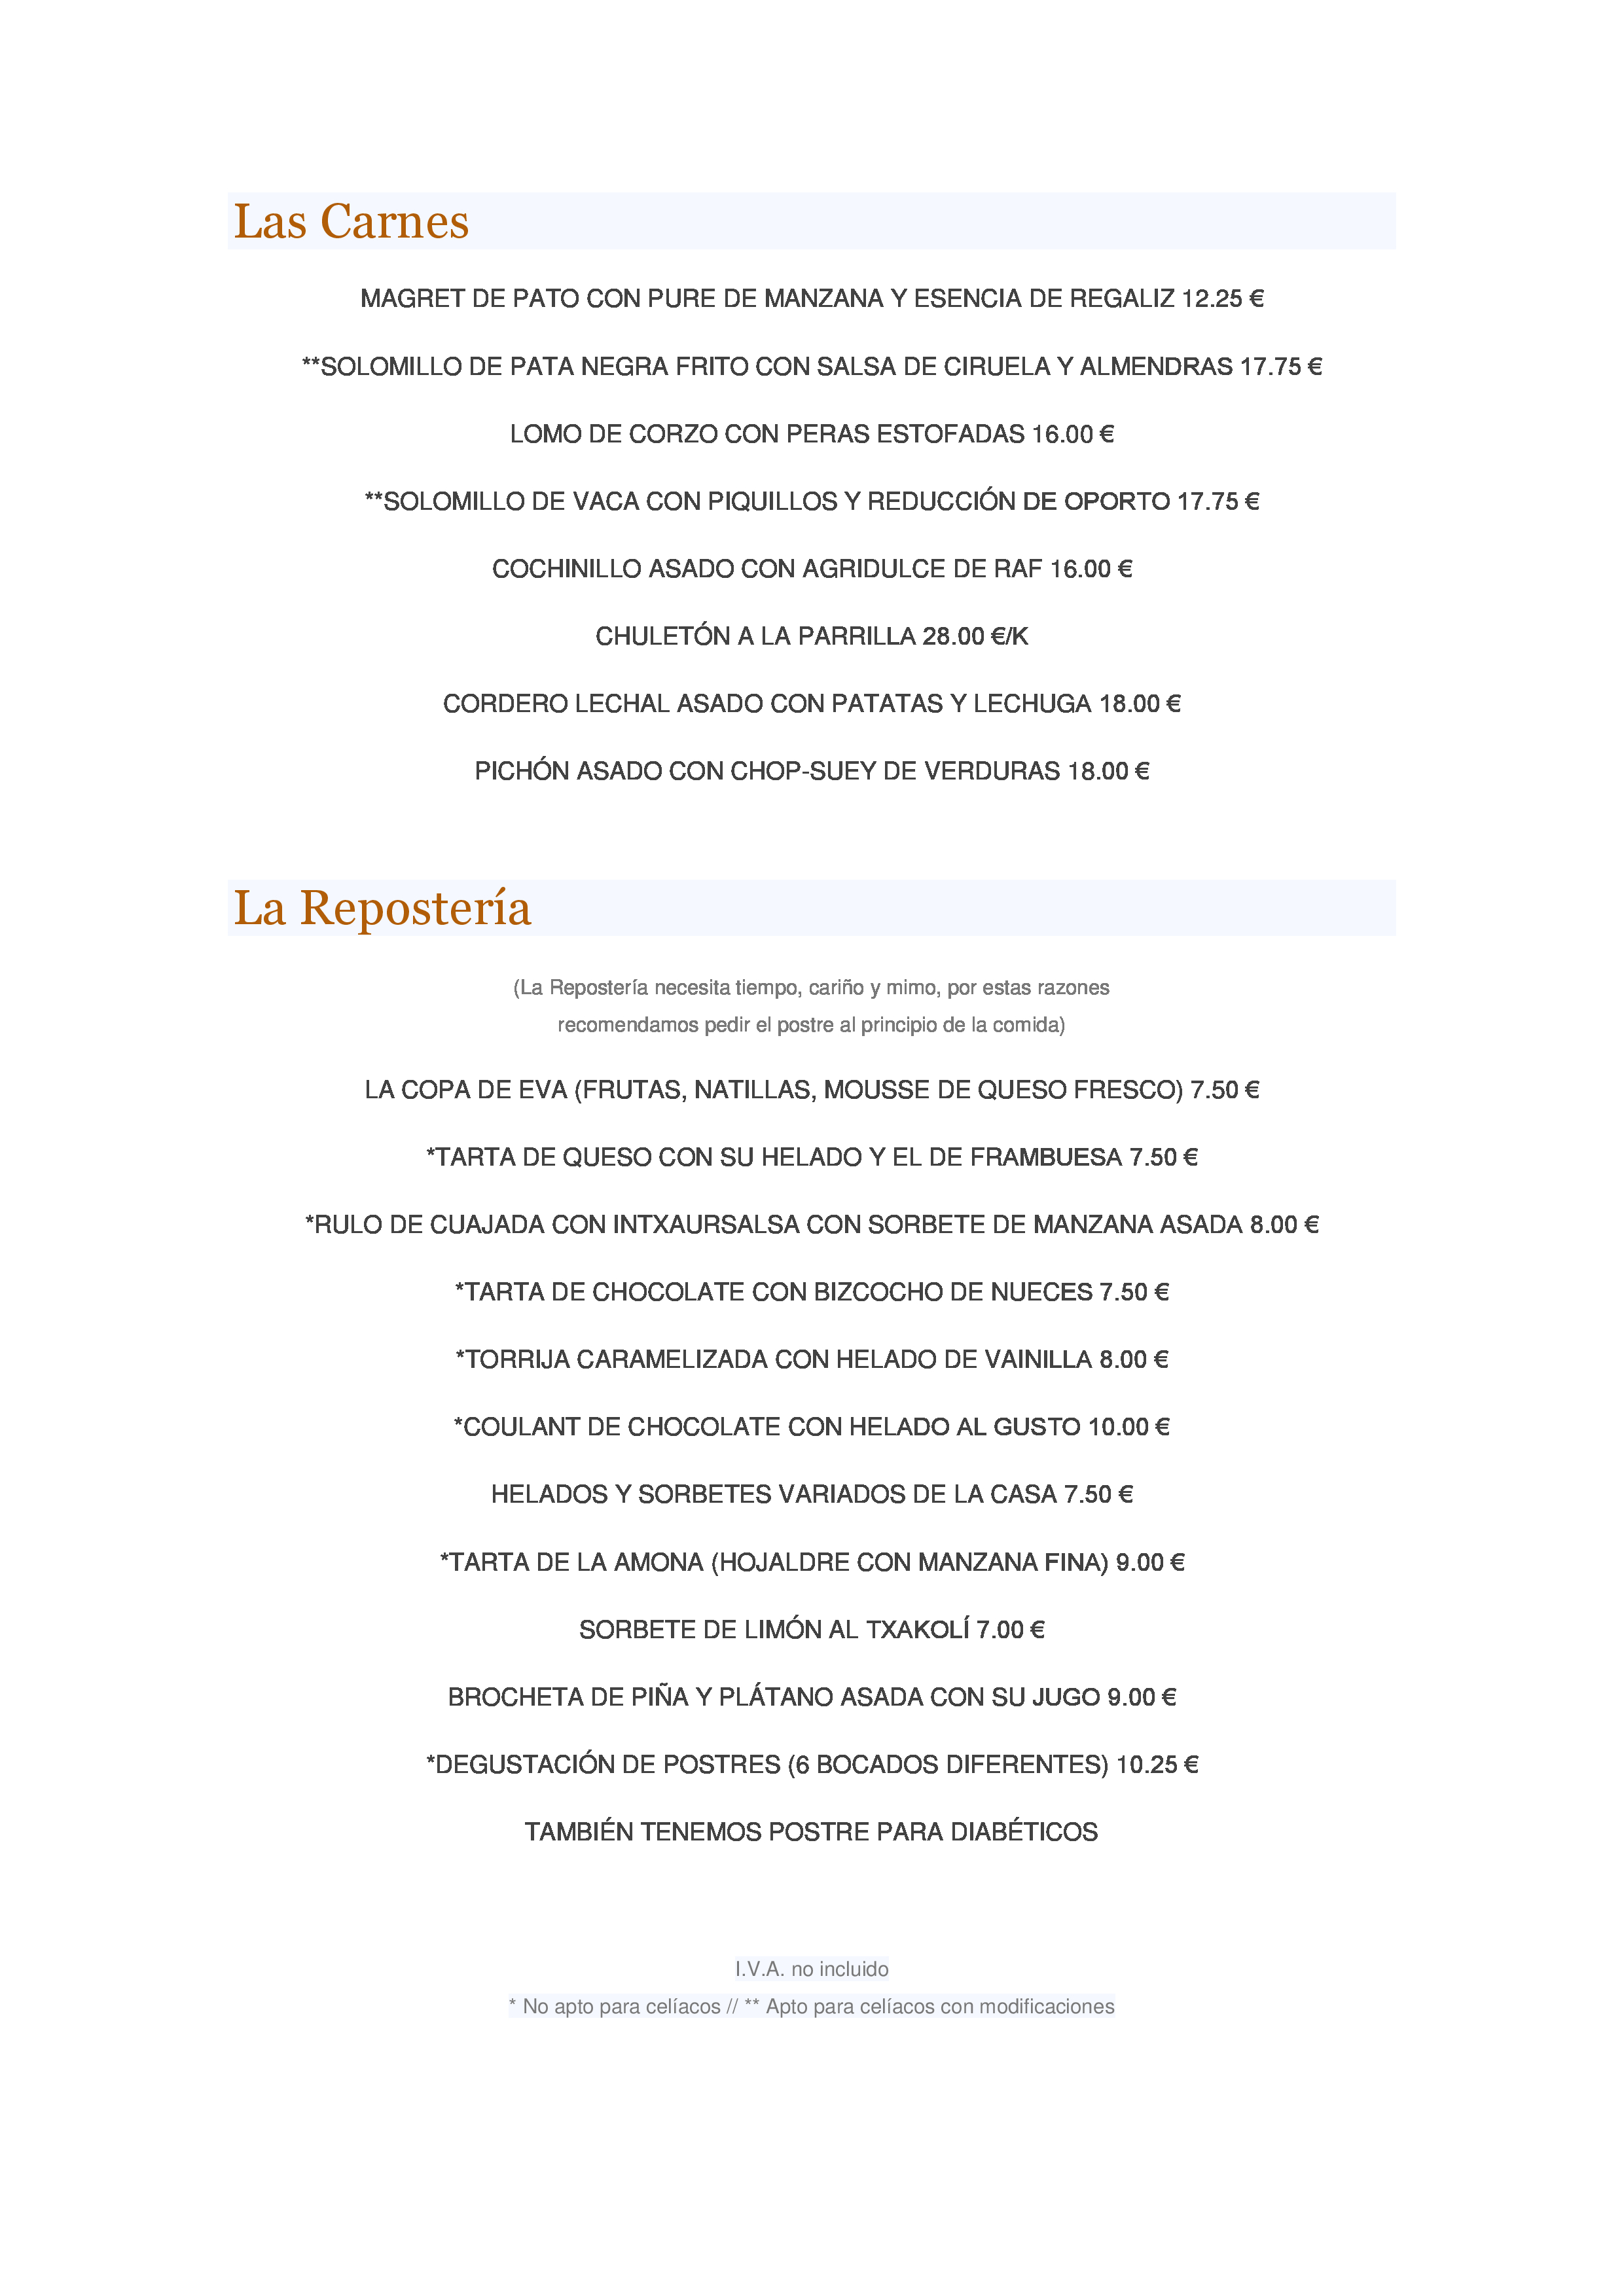 Karlos Arguinano (H. Karlos Arguinano) Carta